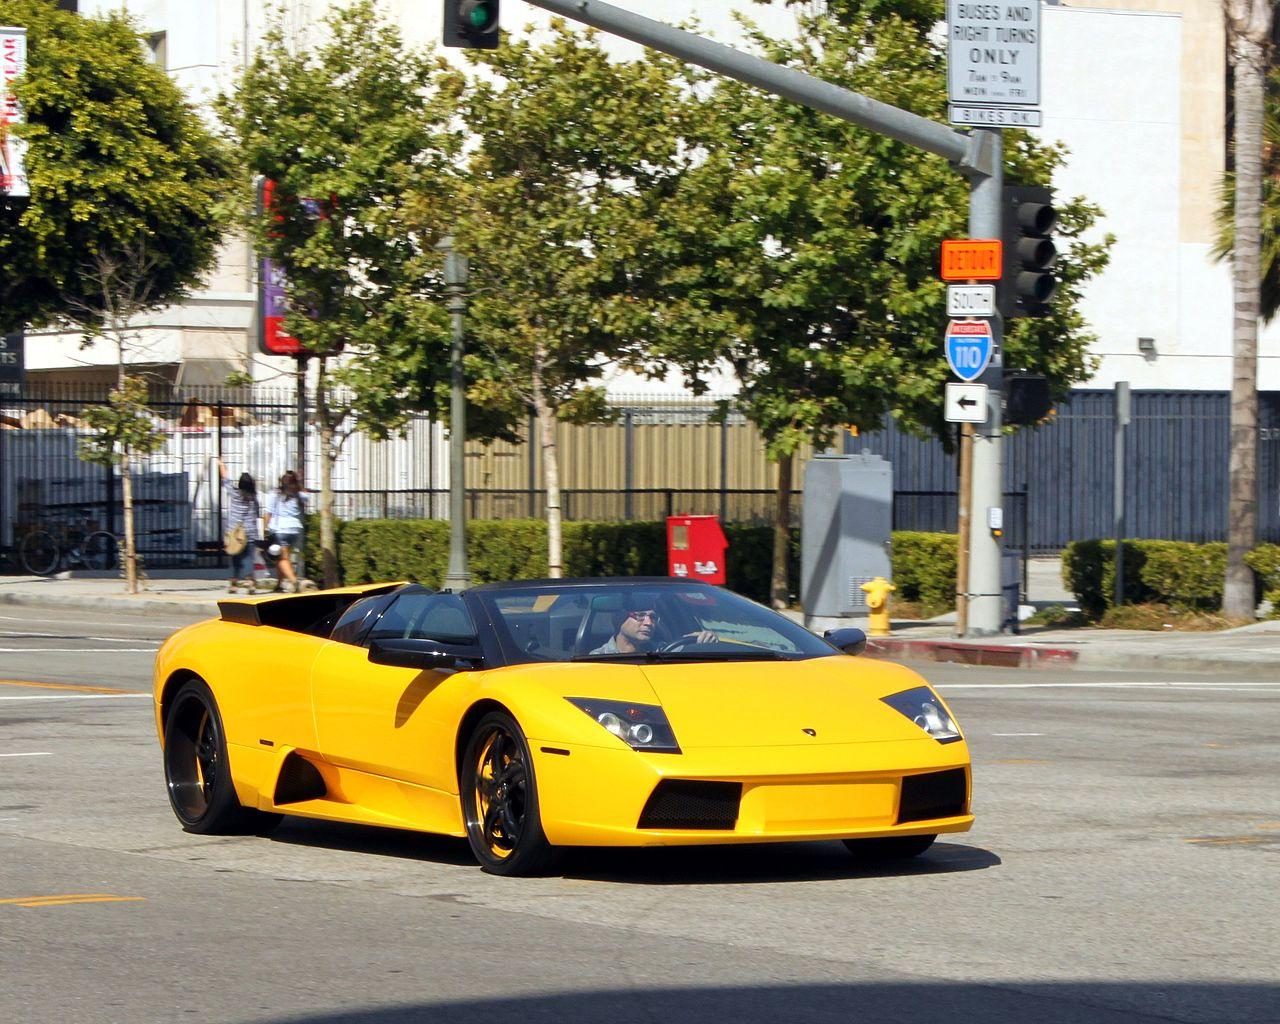 2021 Lamborghini Www Imgkid Com The Image Kid Has It